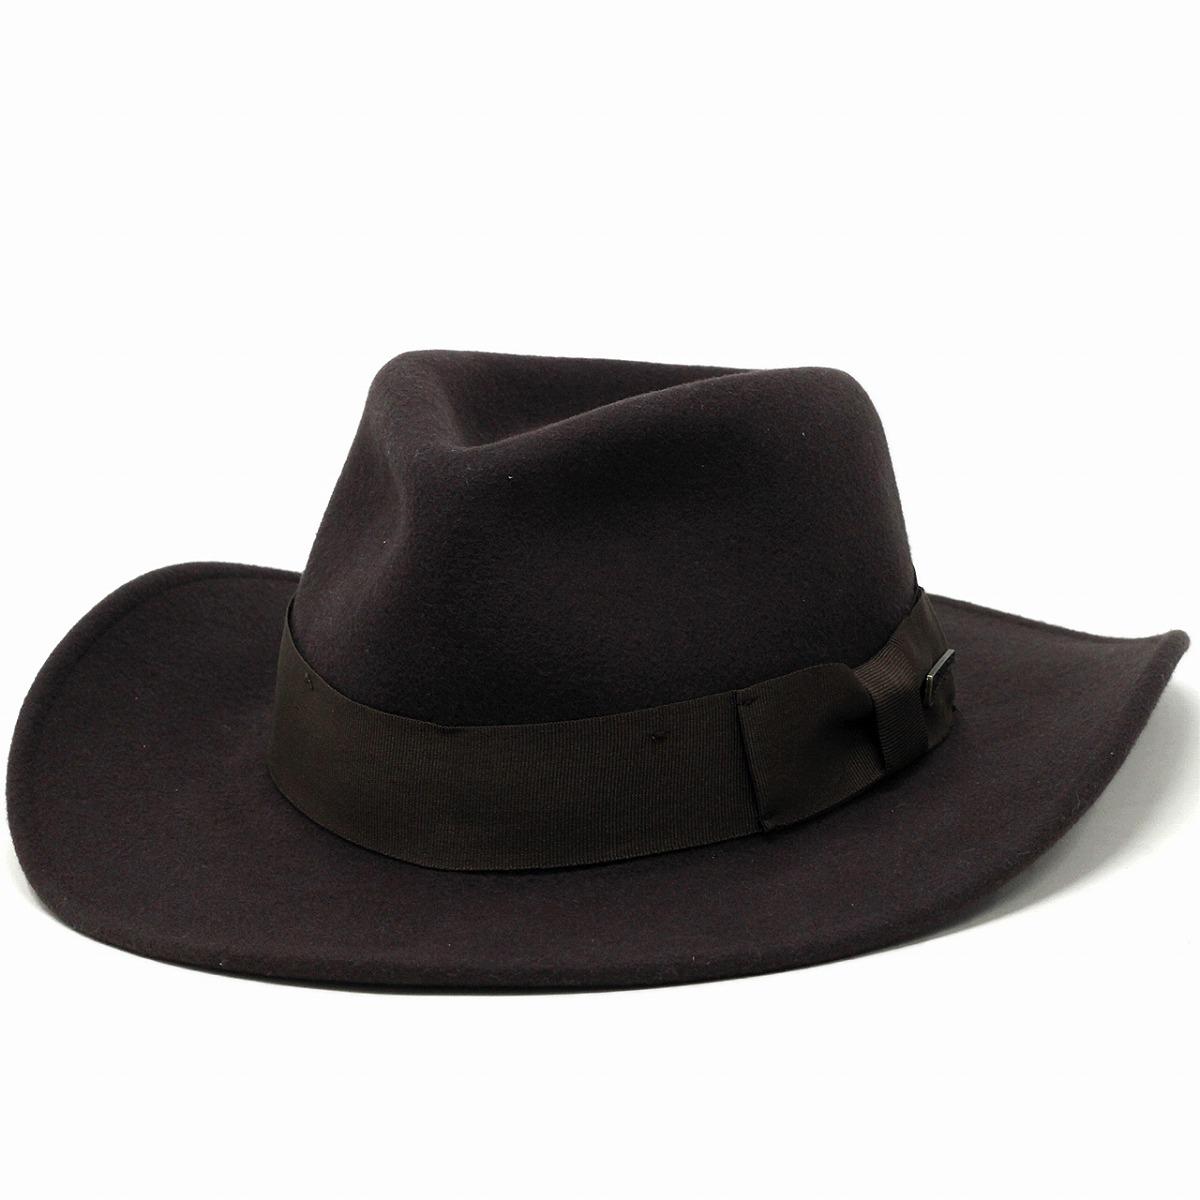 5d9395360eea7 ELEHELM HAT STORE  Indiana Jones Hat wide brim crushable wool felt men s  outback Hat Disney winter   Brown